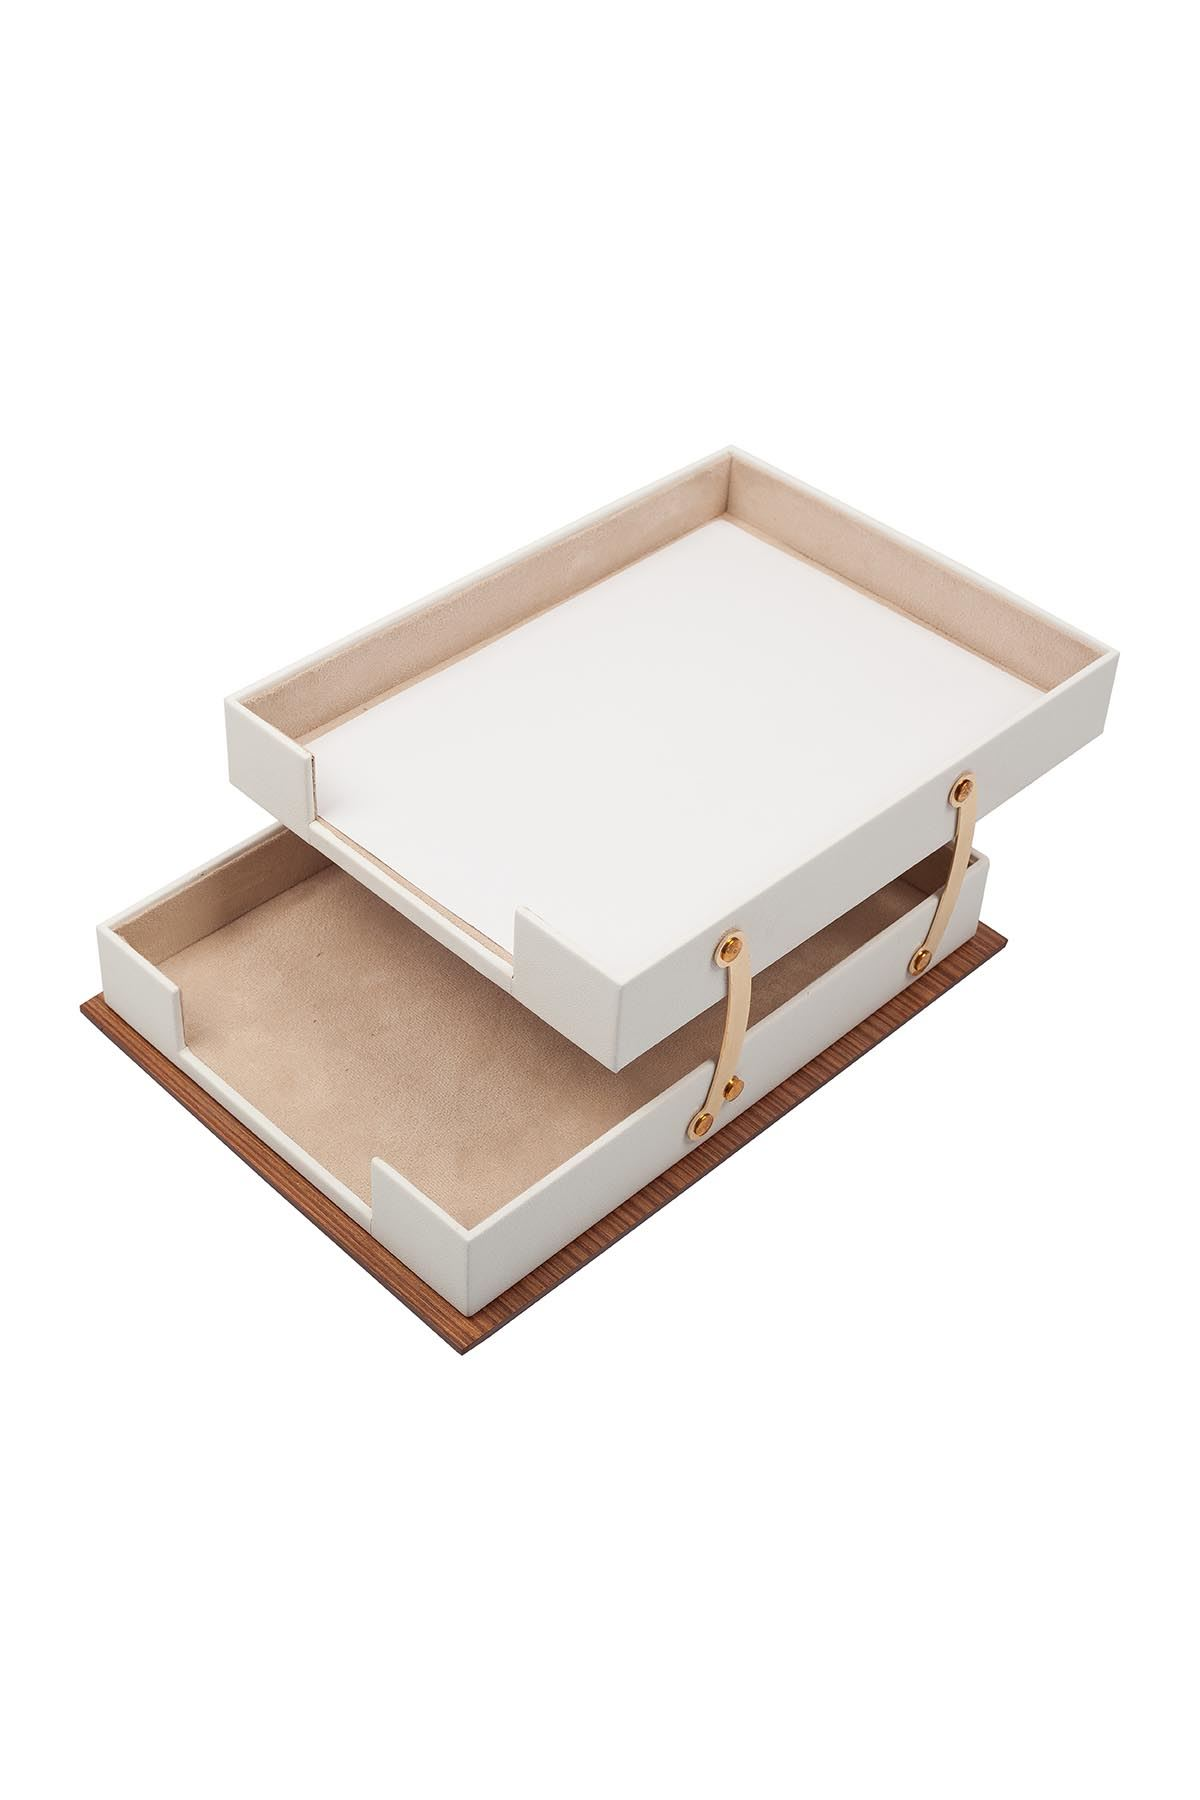 Star Lux Leather Desk Set White 11 Accessories